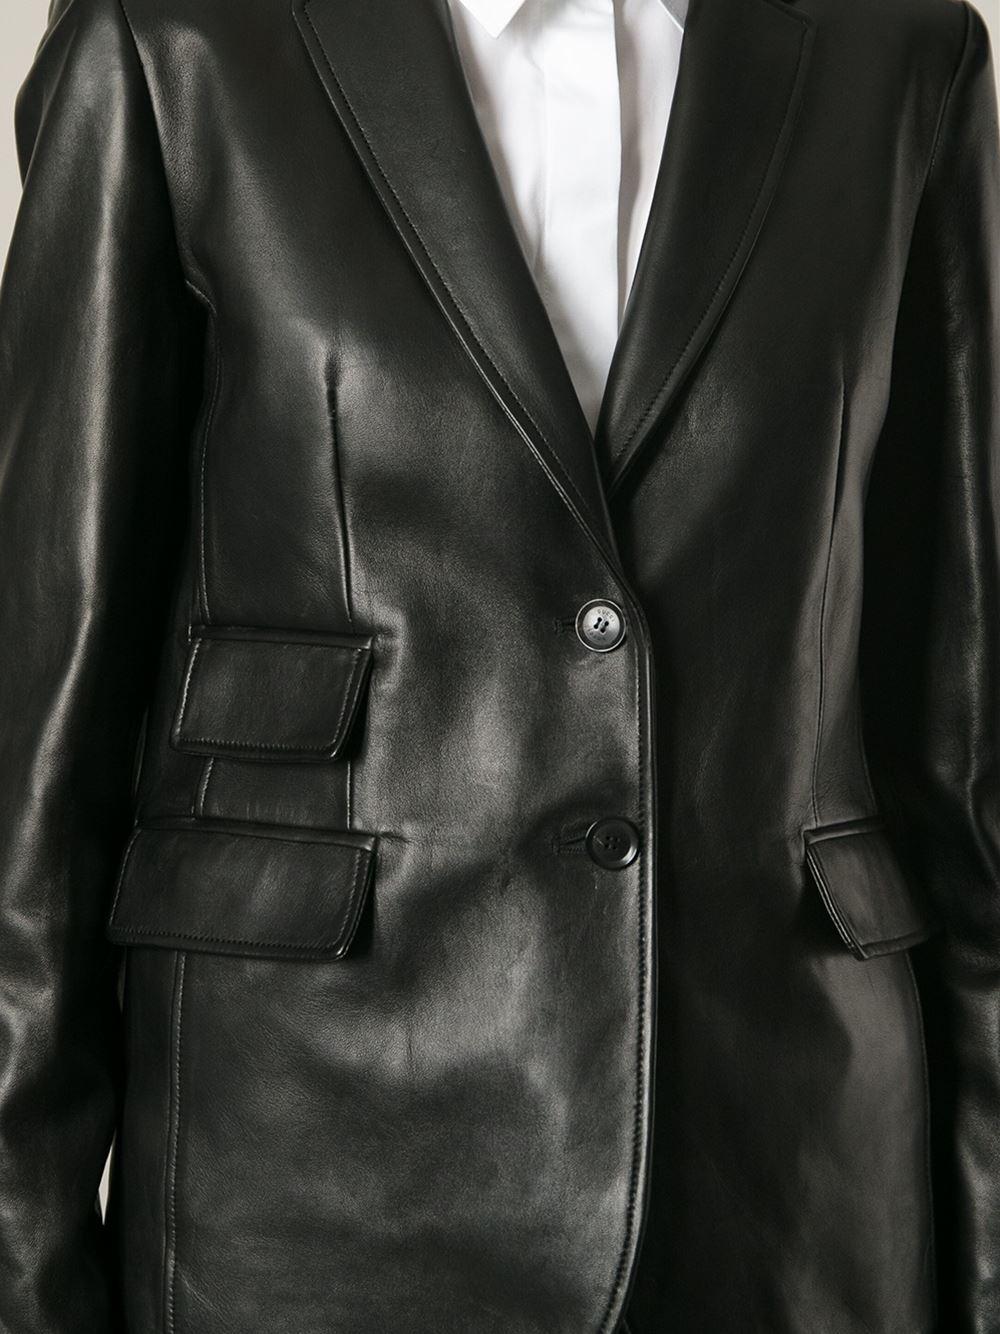 98912586e83 Black Leather Gucci Jacket